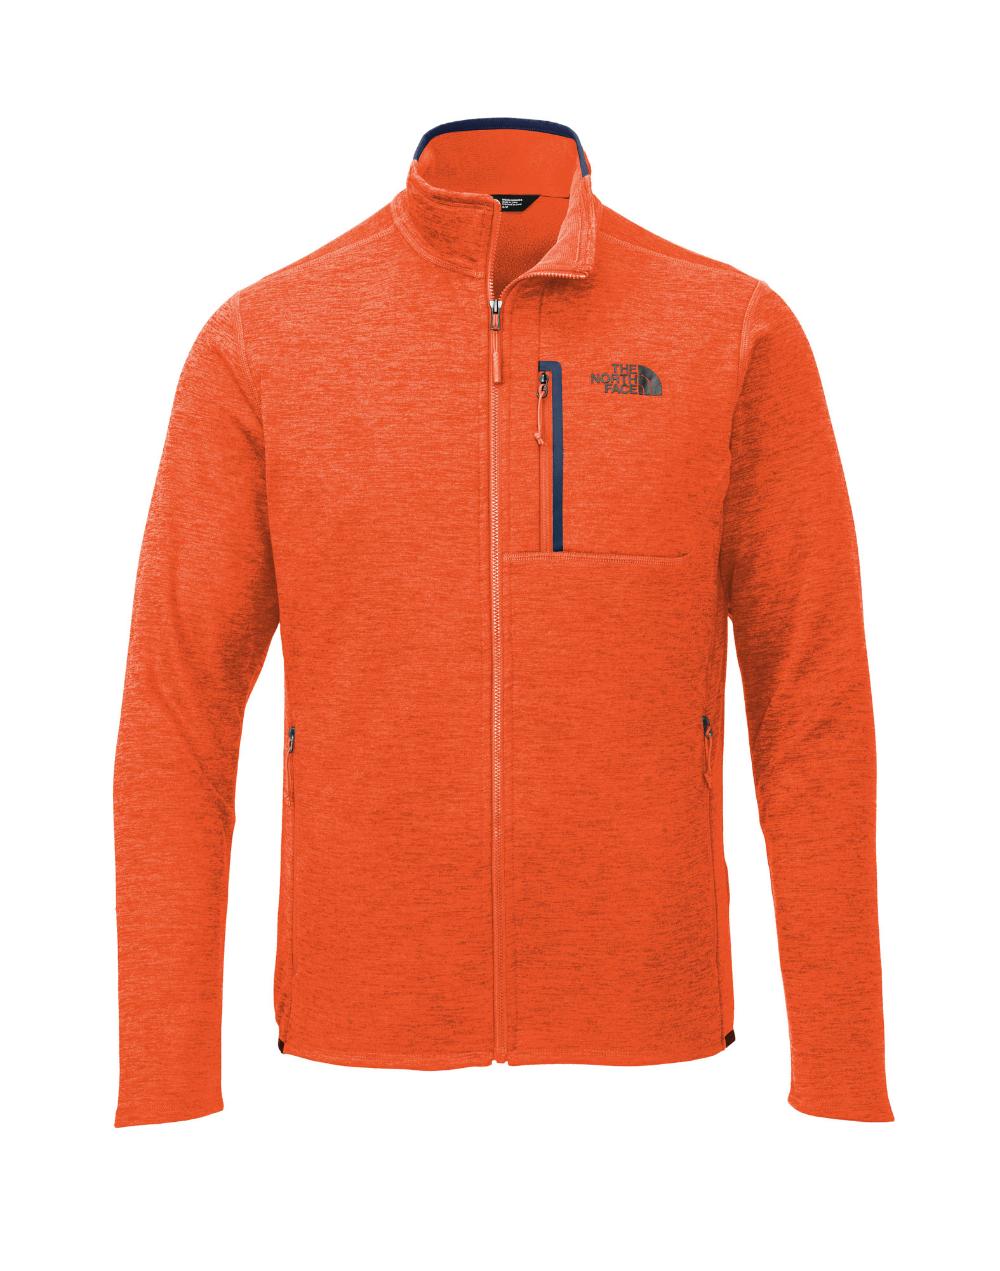 Custom North Face Mens Skyline Full Zip Fleece Jacket North Face Outfits Fleece Jacket The North Face [ 1271 x 1000 Pixel ]